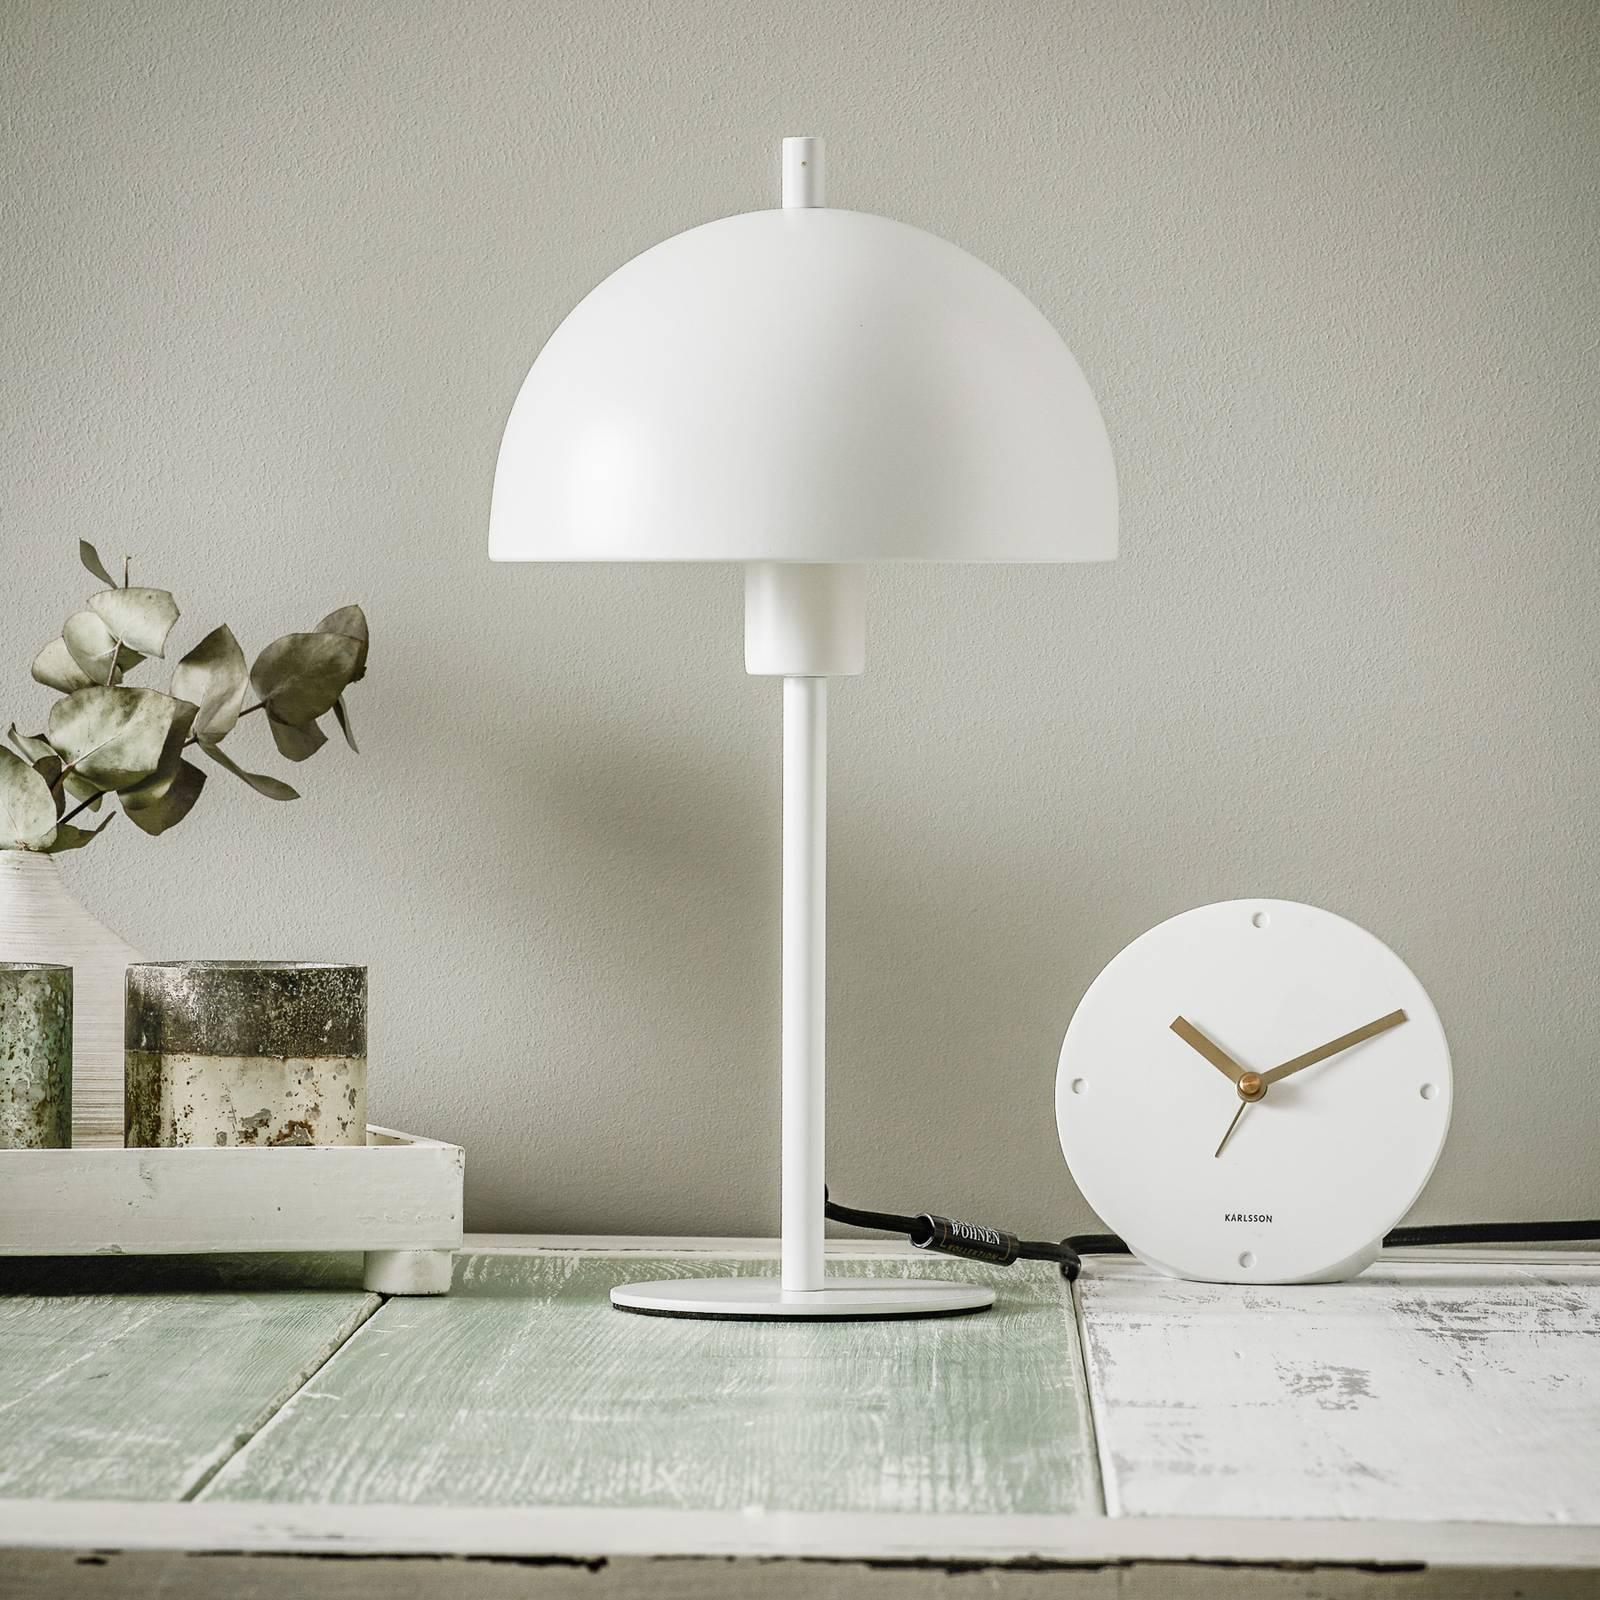 Schöner Wohnen Kia -pöytälamppu valkoinen, 34 cm